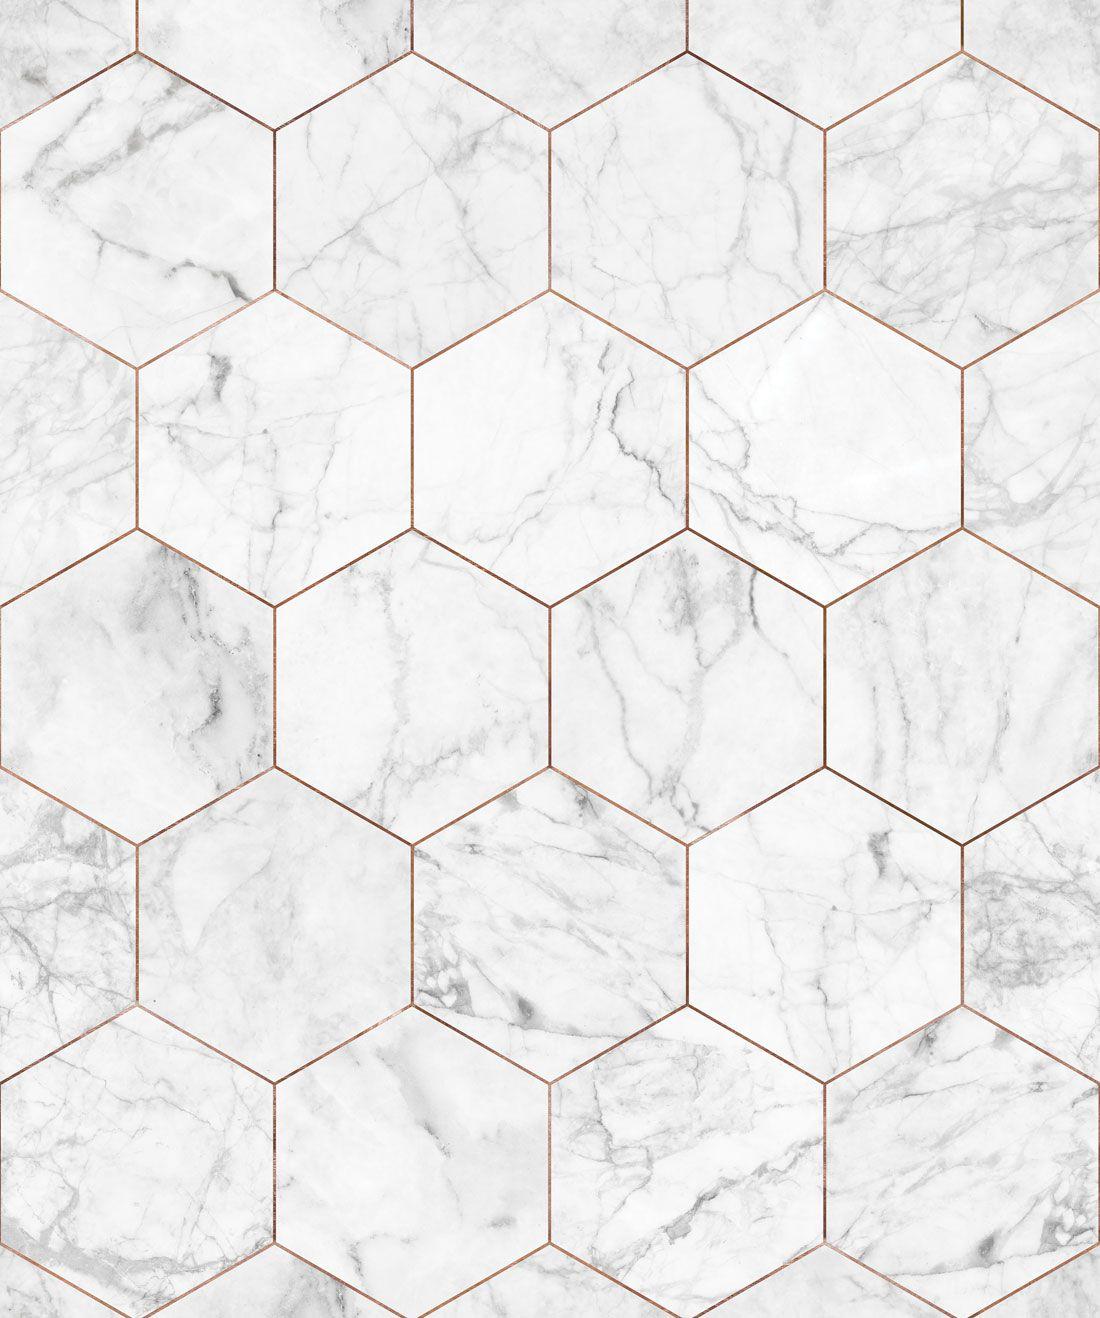 Marble Copper Tiles Wallpaper Crisp Marble Tiles Milton King In 2021 Tile Wallpaper White Marble Tiles Copper Tiles